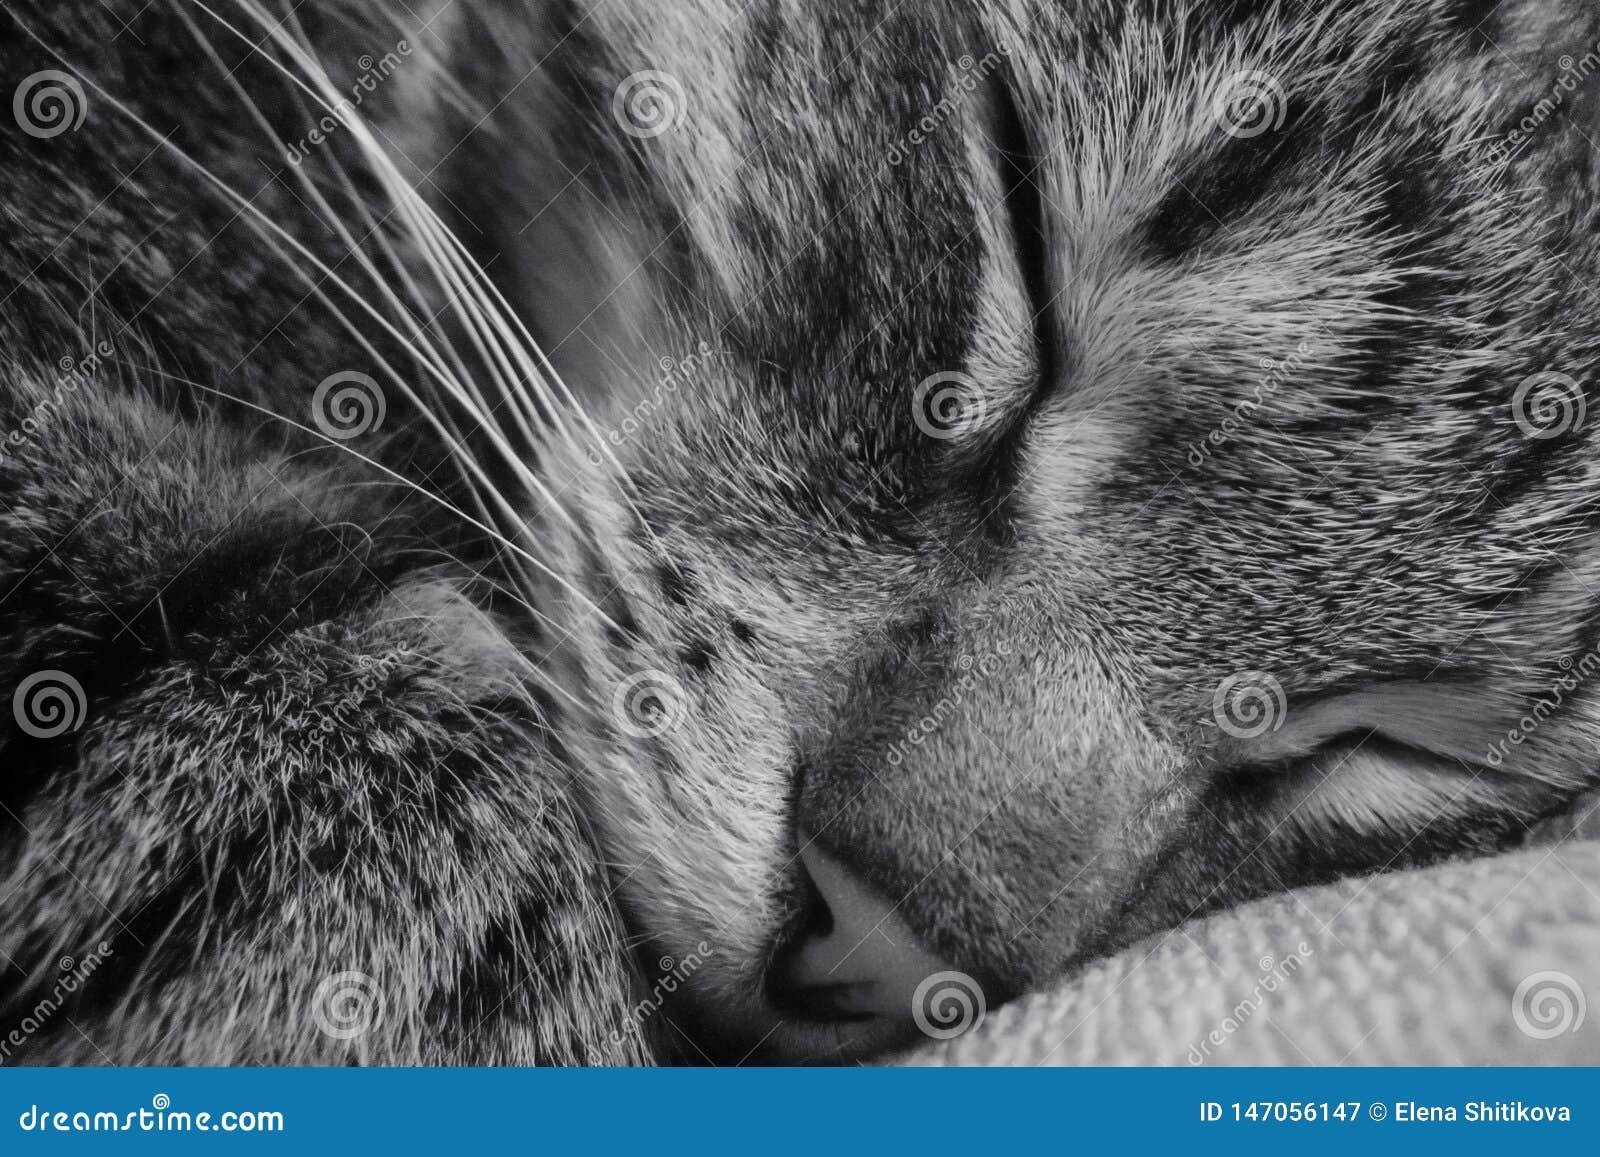 Sleeping cat. Close-up